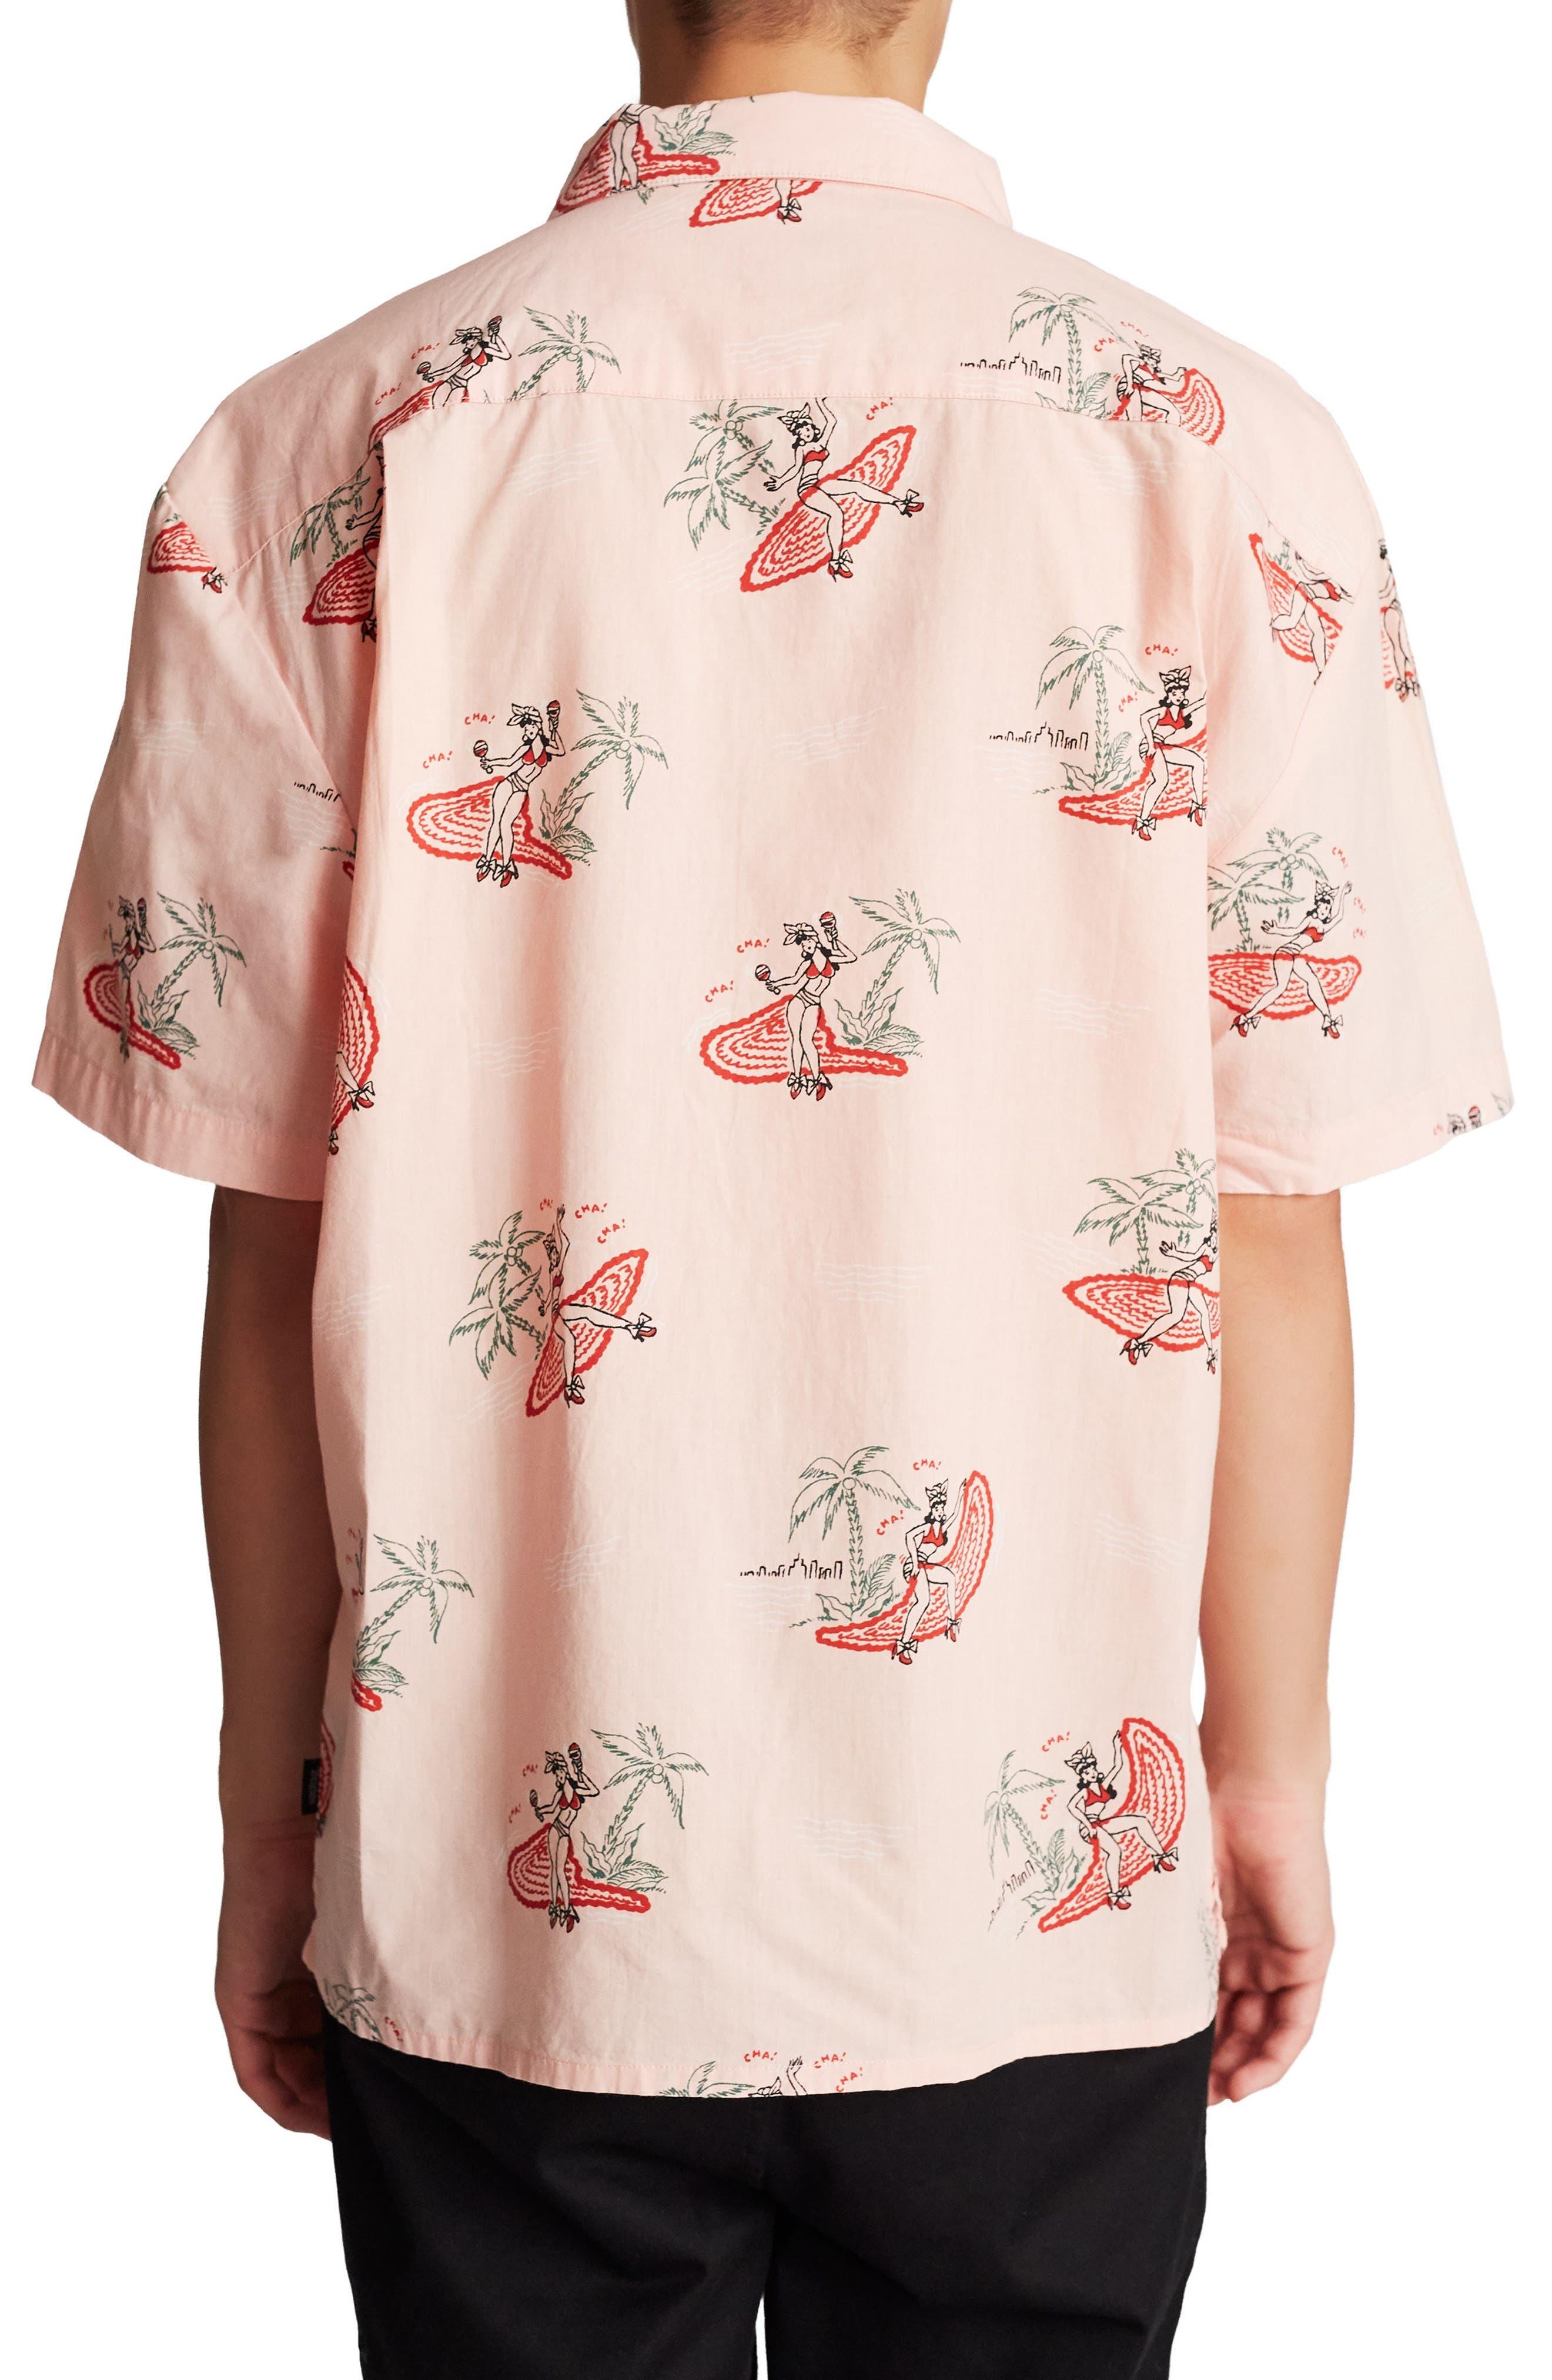 Bueller Woven Shirt,                             Alternate thumbnail 2, color,                             650